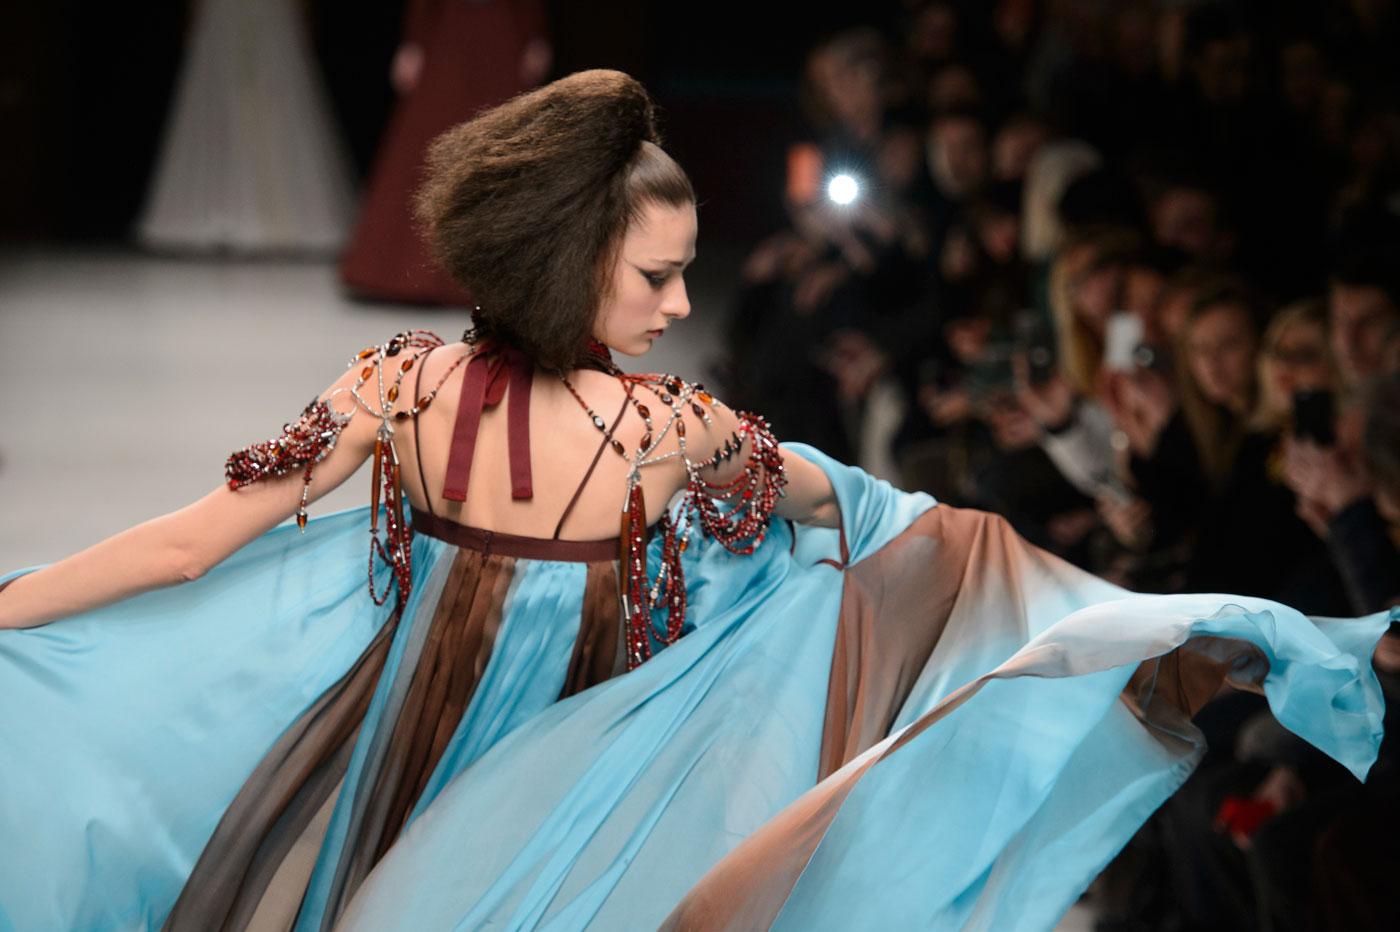 Julien-Fournie-Prive-fashion-runway-show-haute-couture-paris-spring-2015-the-impression-55